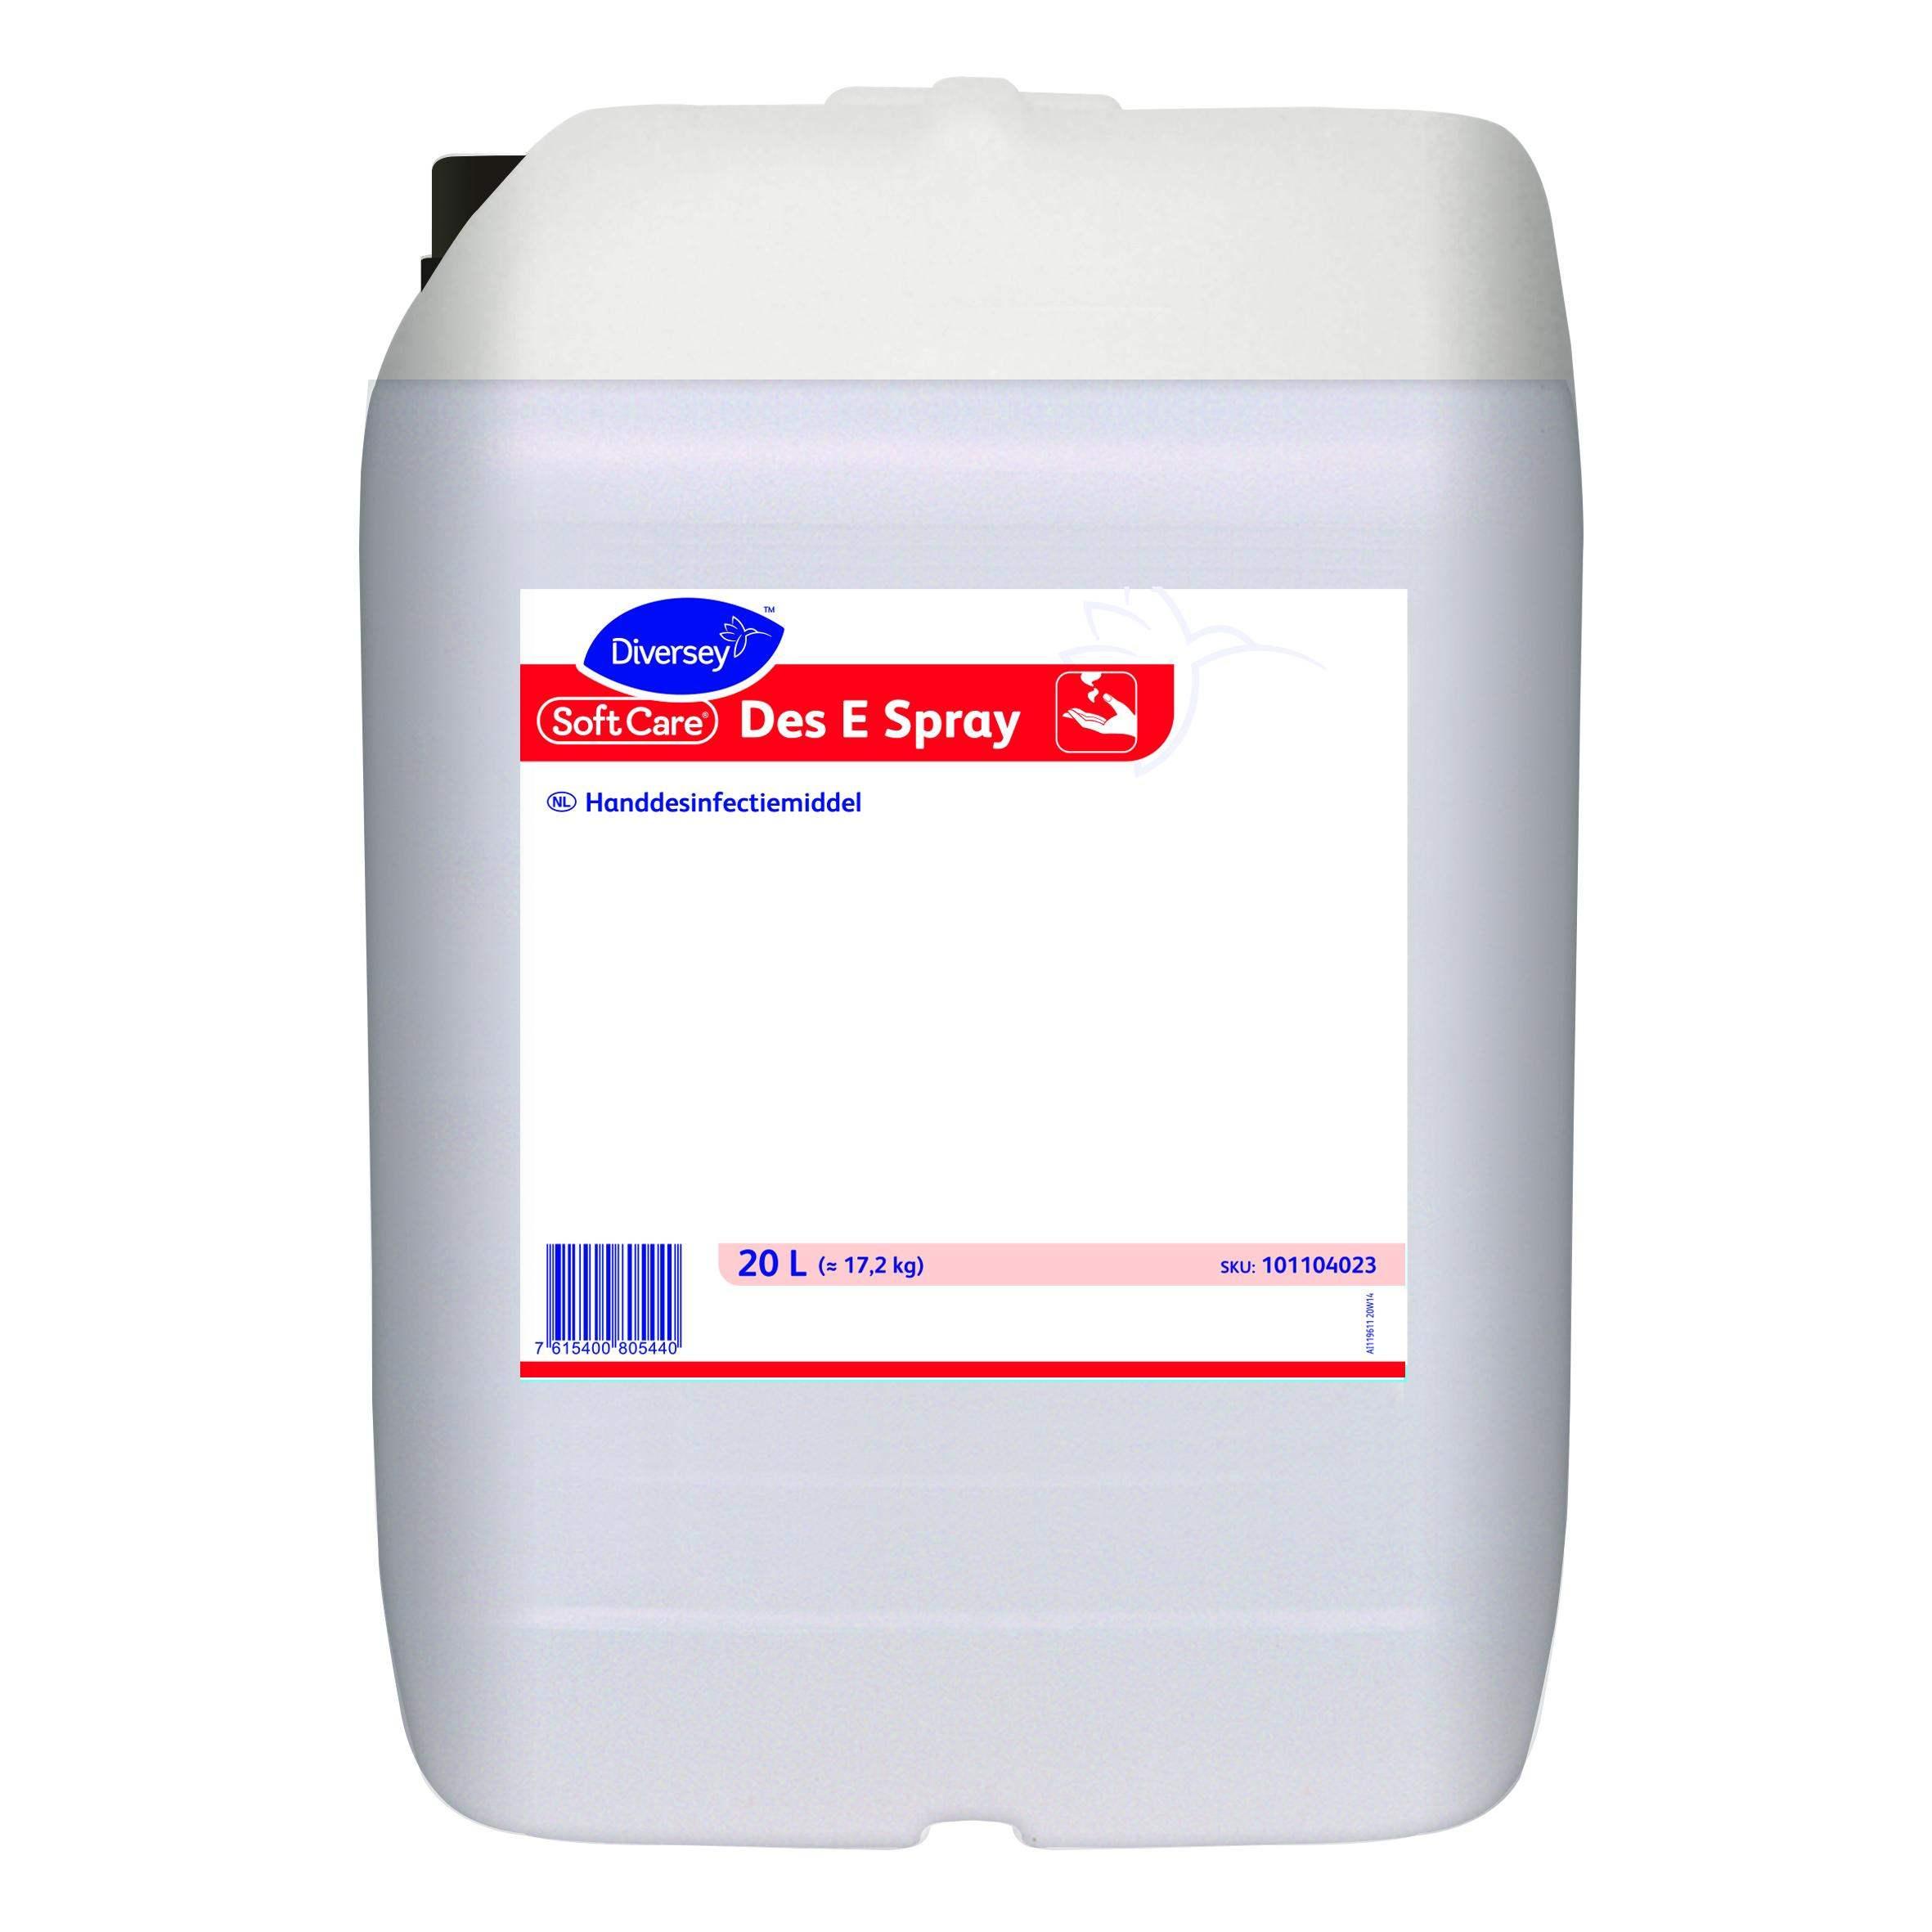 101104023-SoftCare-Des-E-Spray-20L-NL-CMYK-20x20cm.jpg